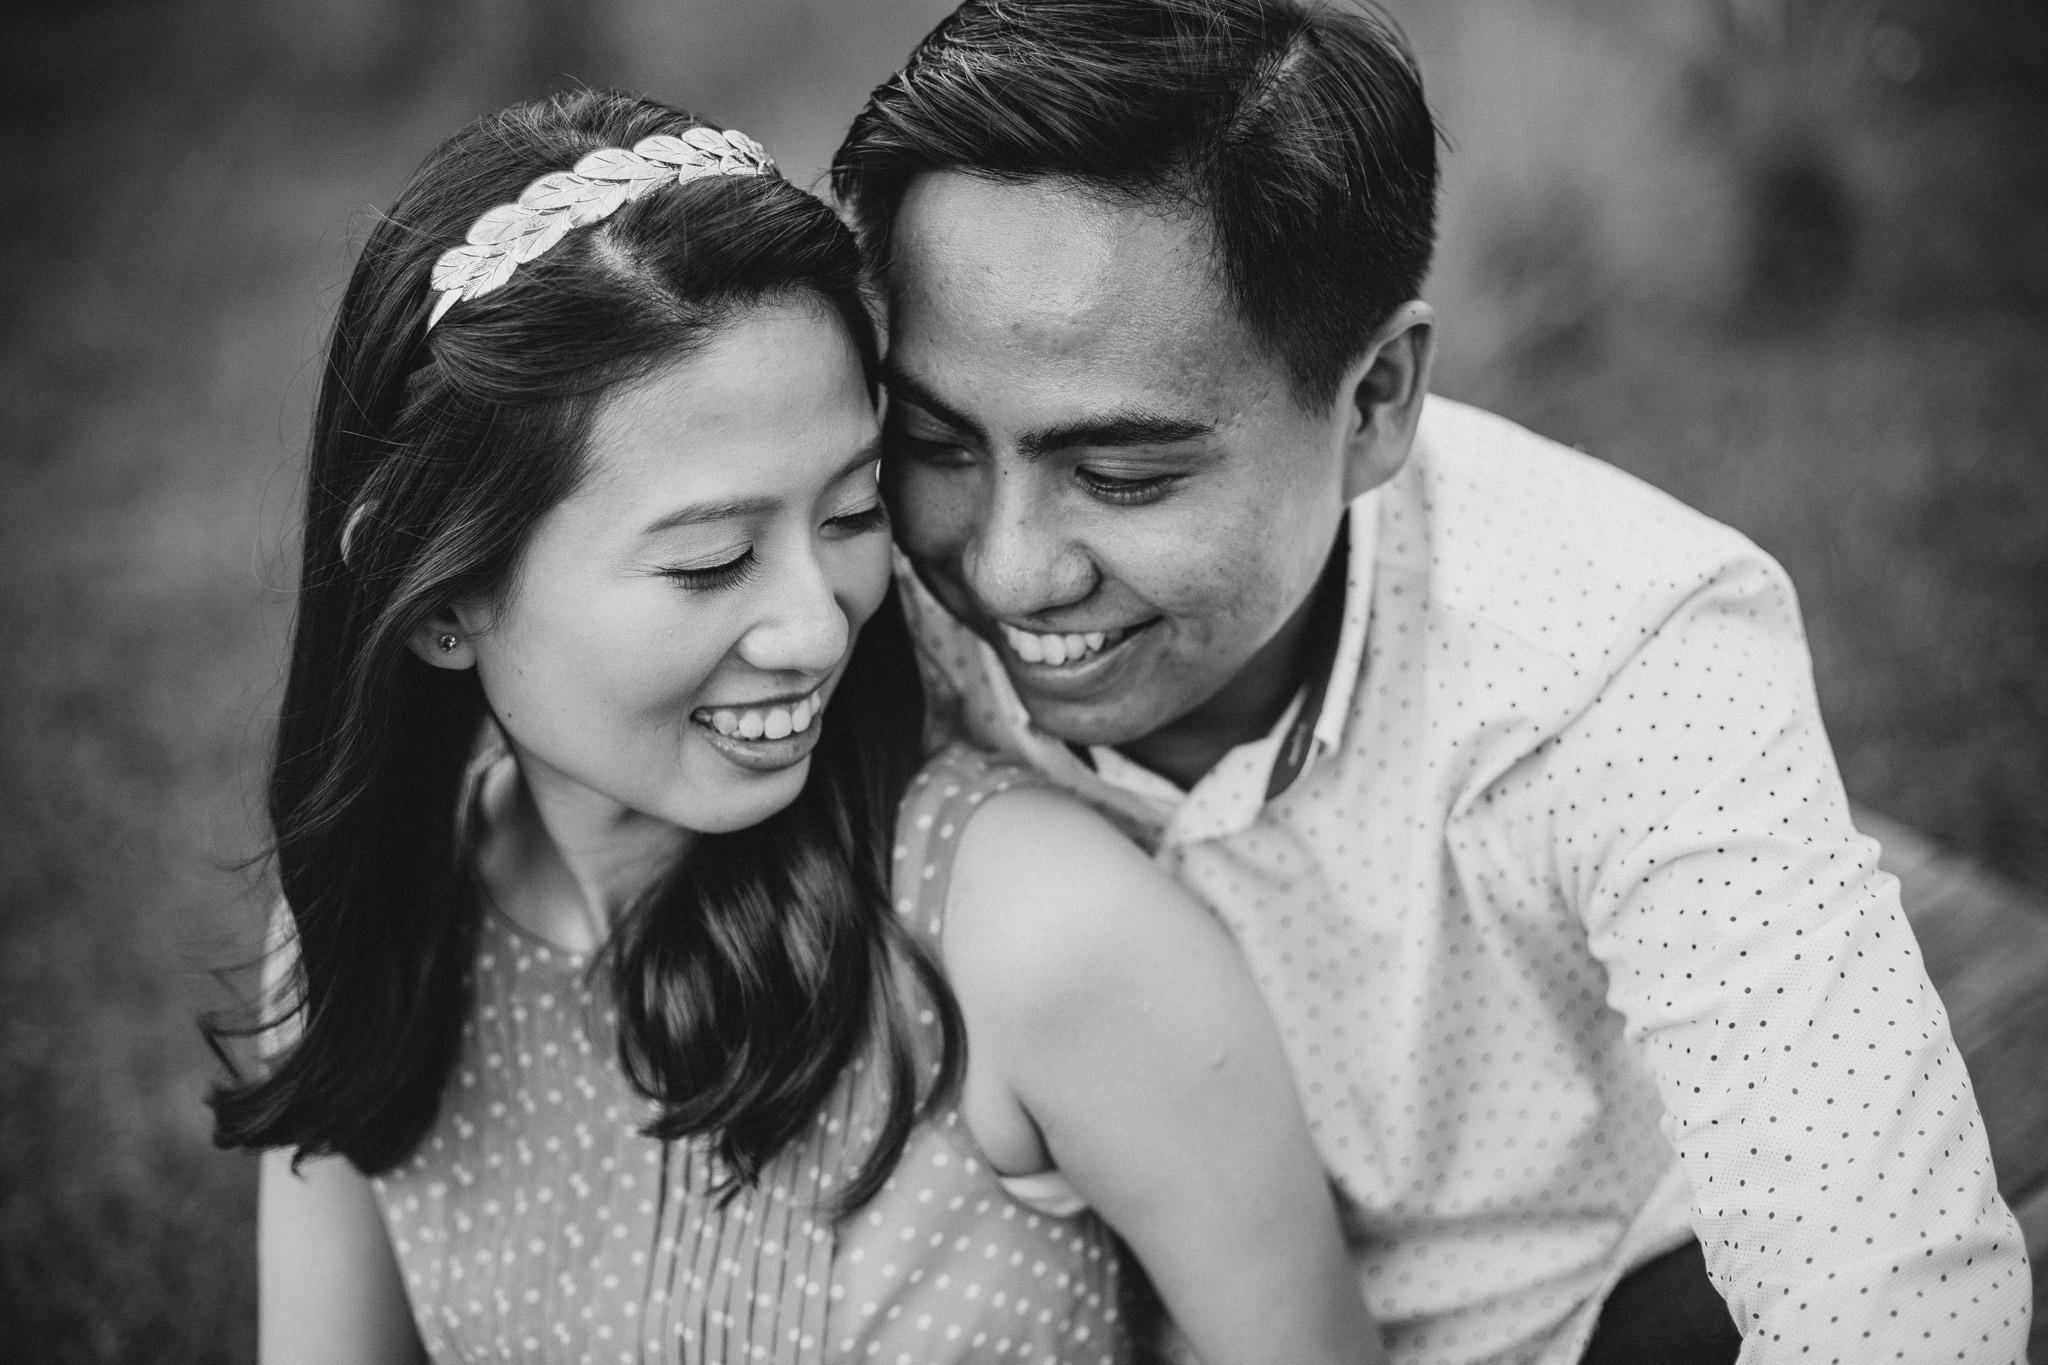 singapore--wedding-photographer-commercial-editorial-travel-wemadethese-firdaus-sasha-sessions-13.jpg